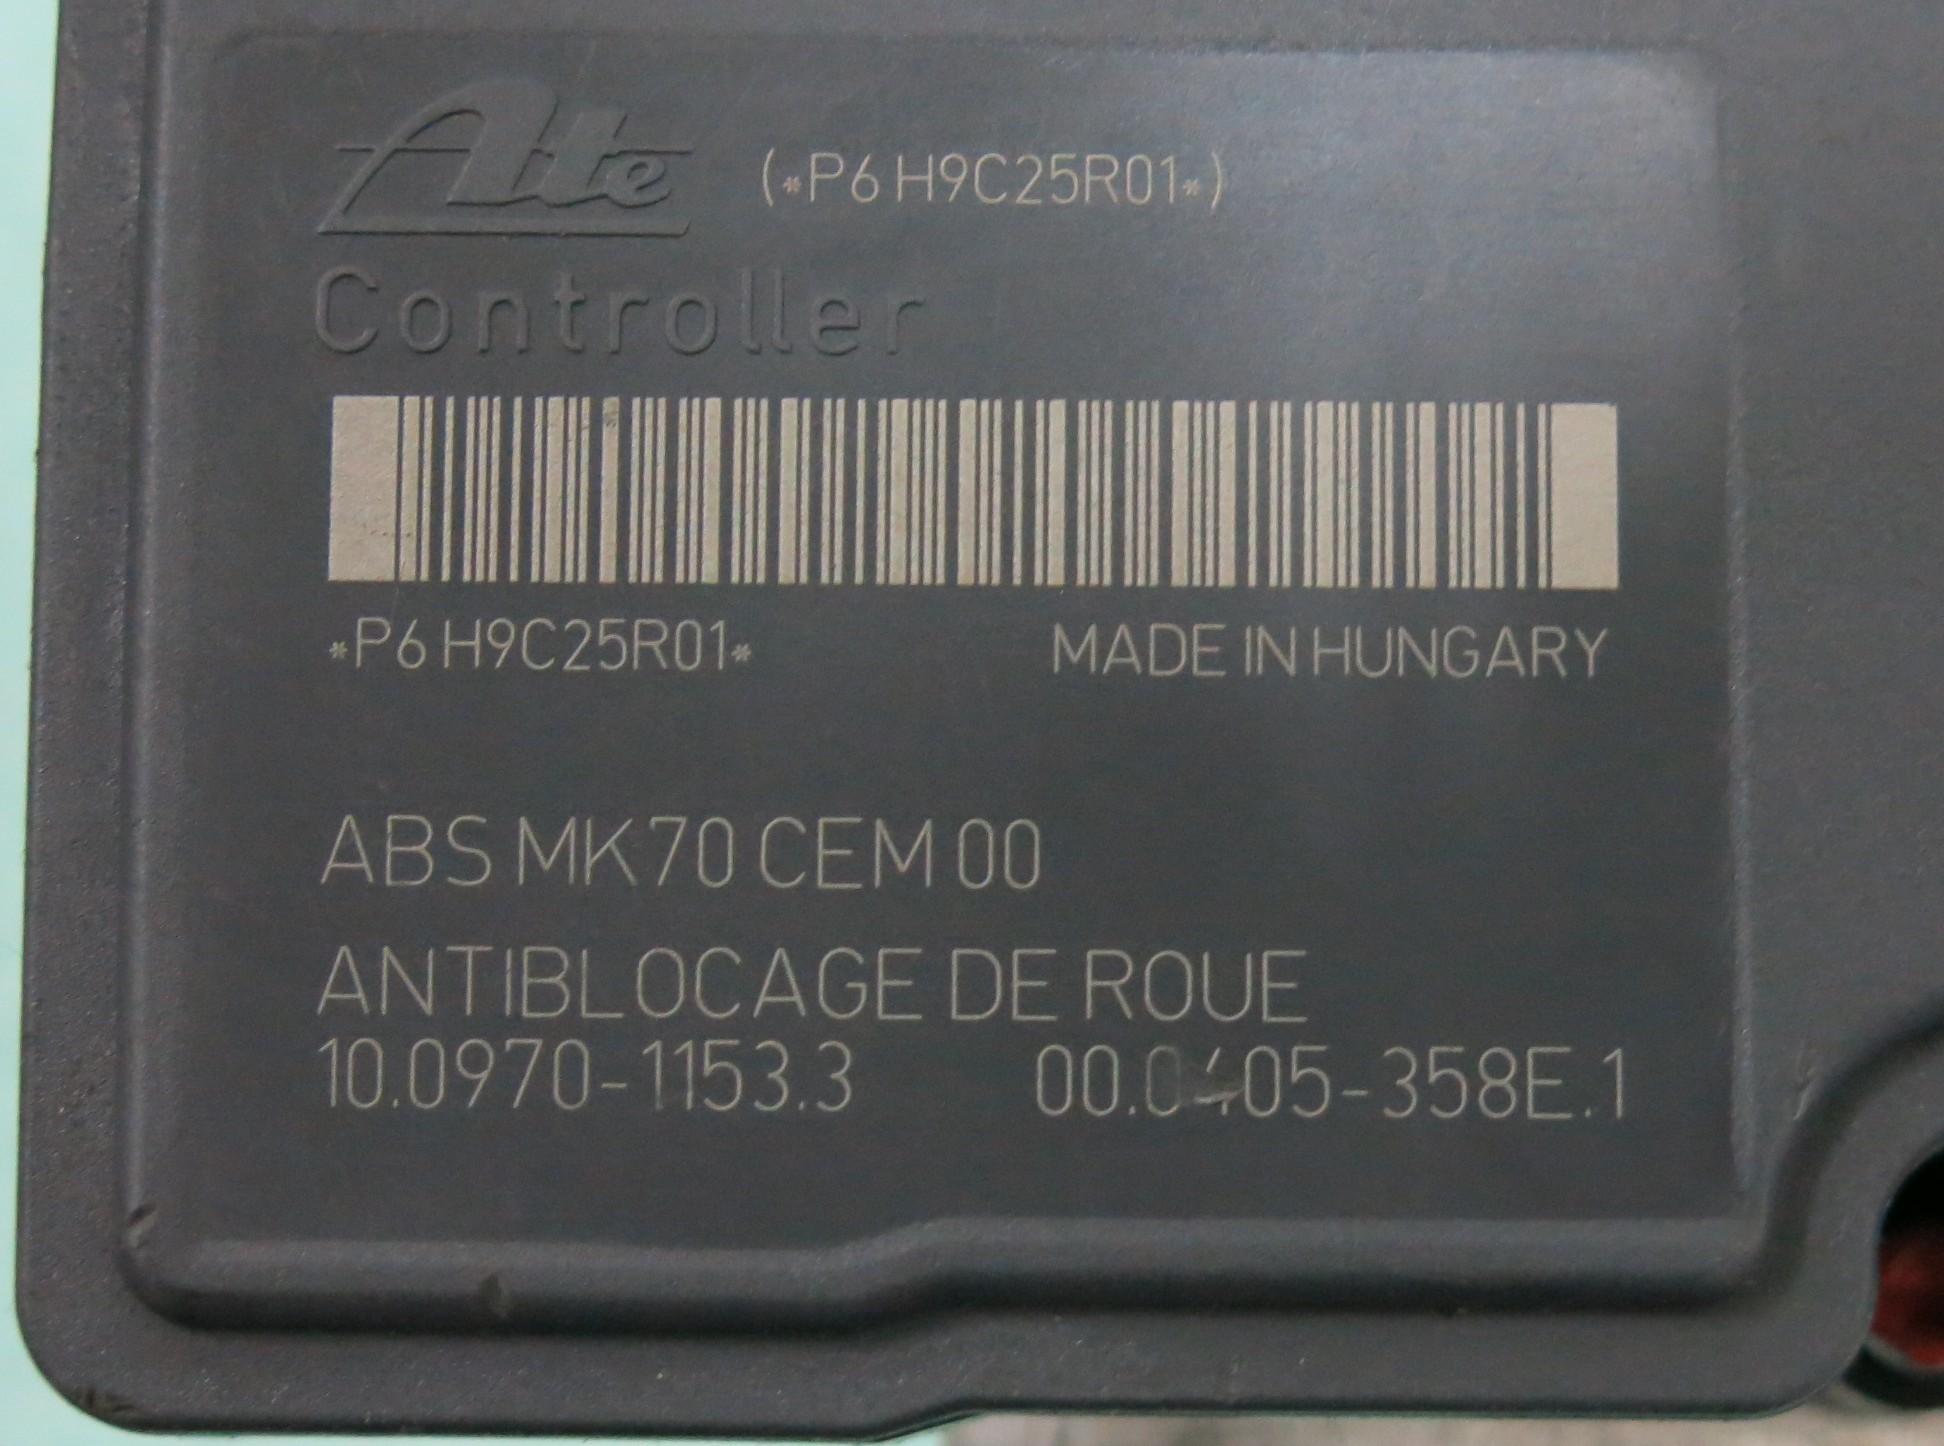 Peugeot 207 Citroen C2 C3 ABS Pump 9665344180 10.0207-0142.4 10.0970-1153.3